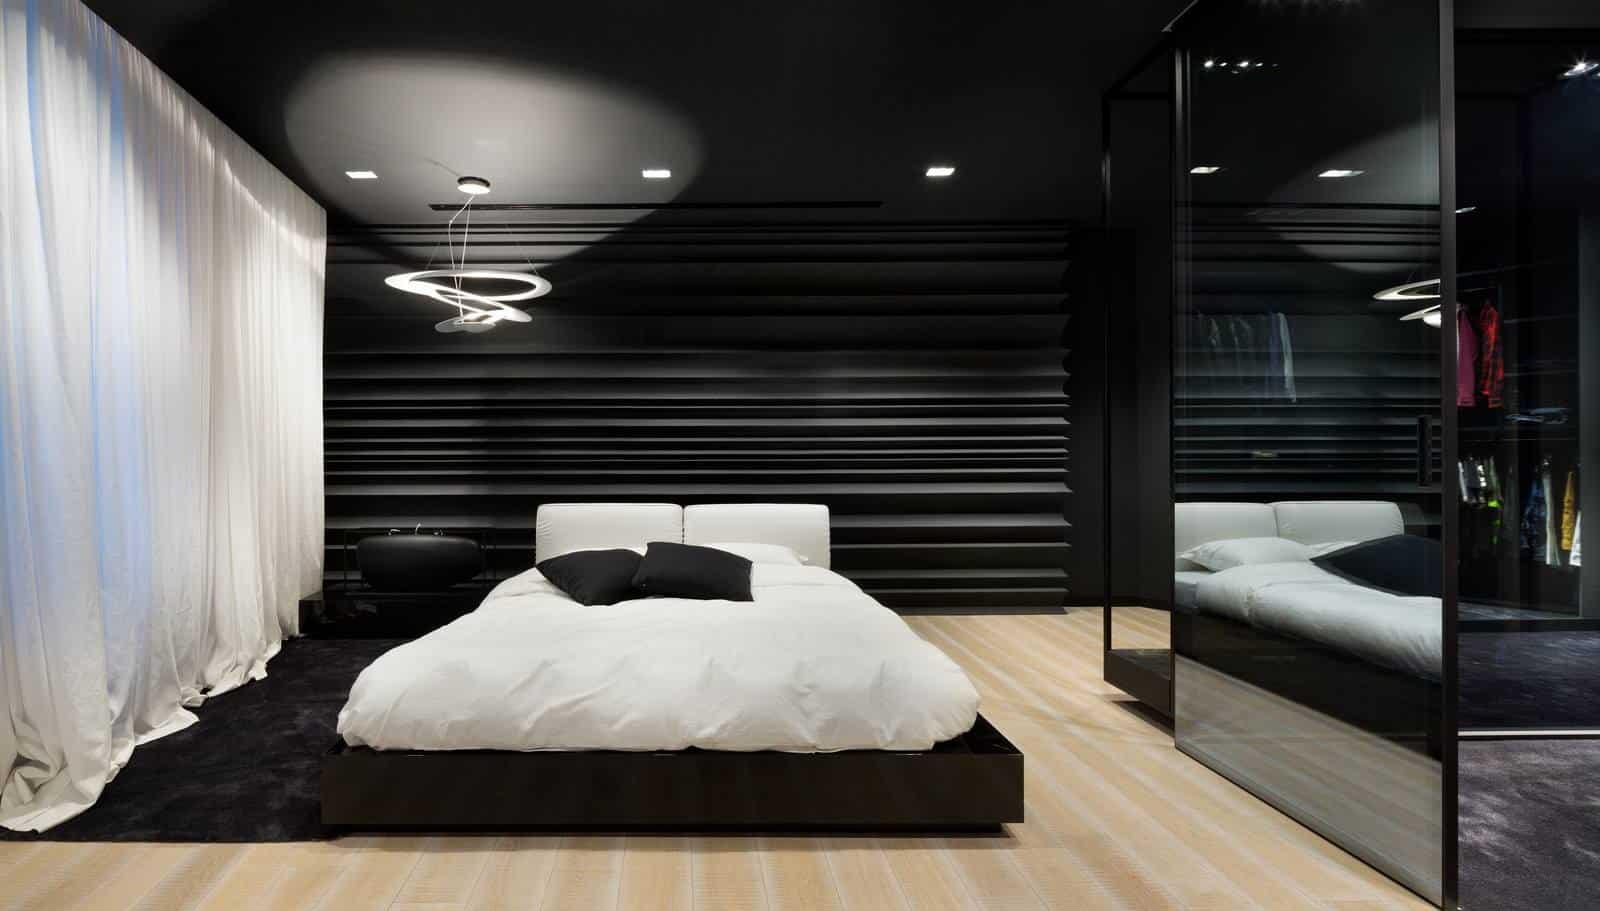 thiet-ke-noi-that-chung-cu-mai-dich-17 Thiết kế nội thất chung cư Mai Dịch - A. Sinh